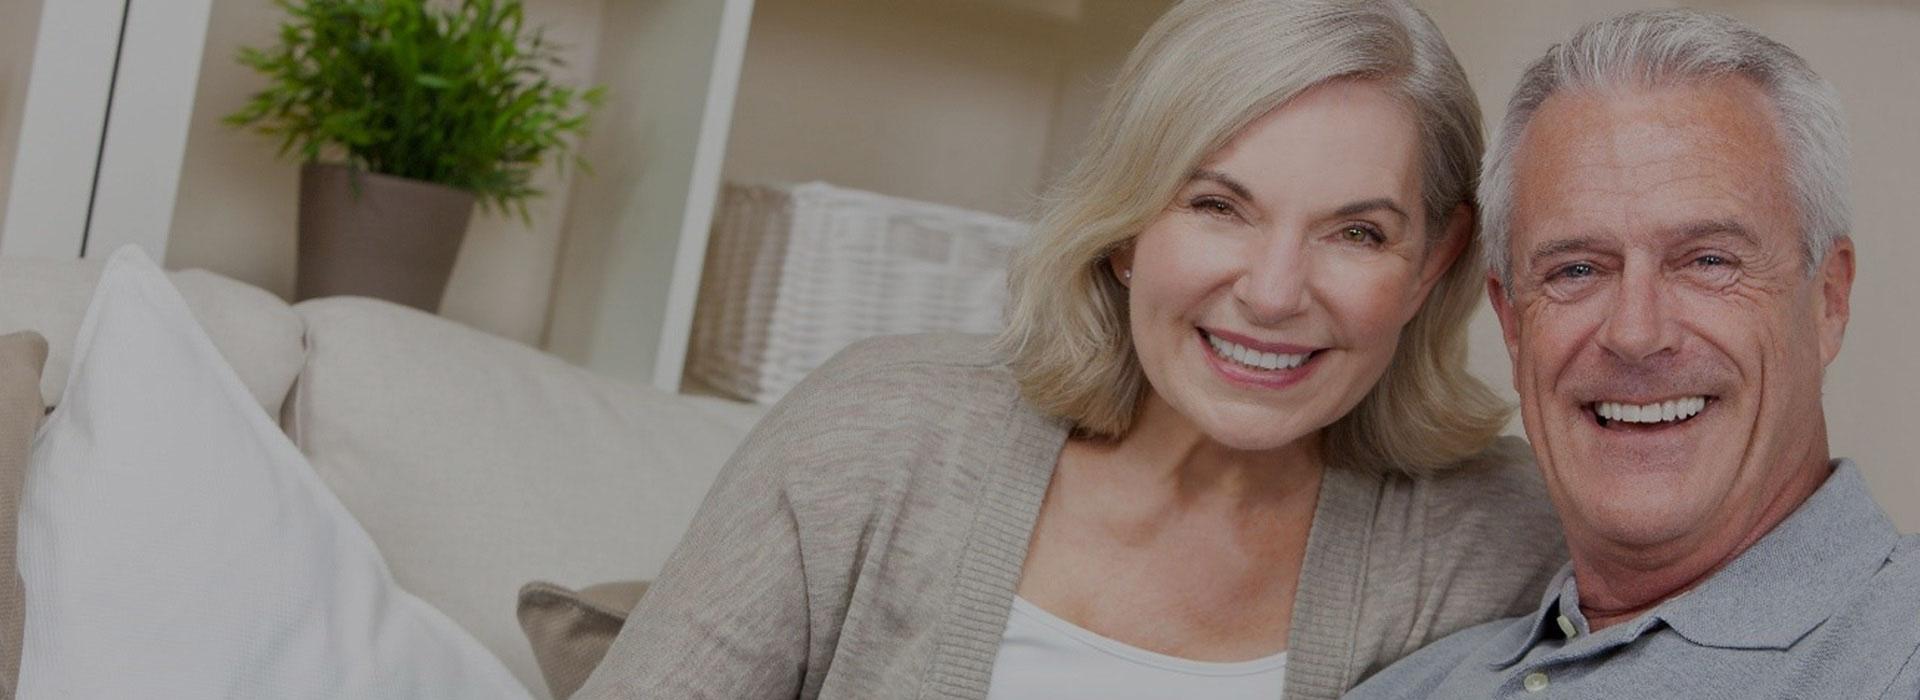 AussieGlide Stairlift Solution smiling Elder Couple Silder Image